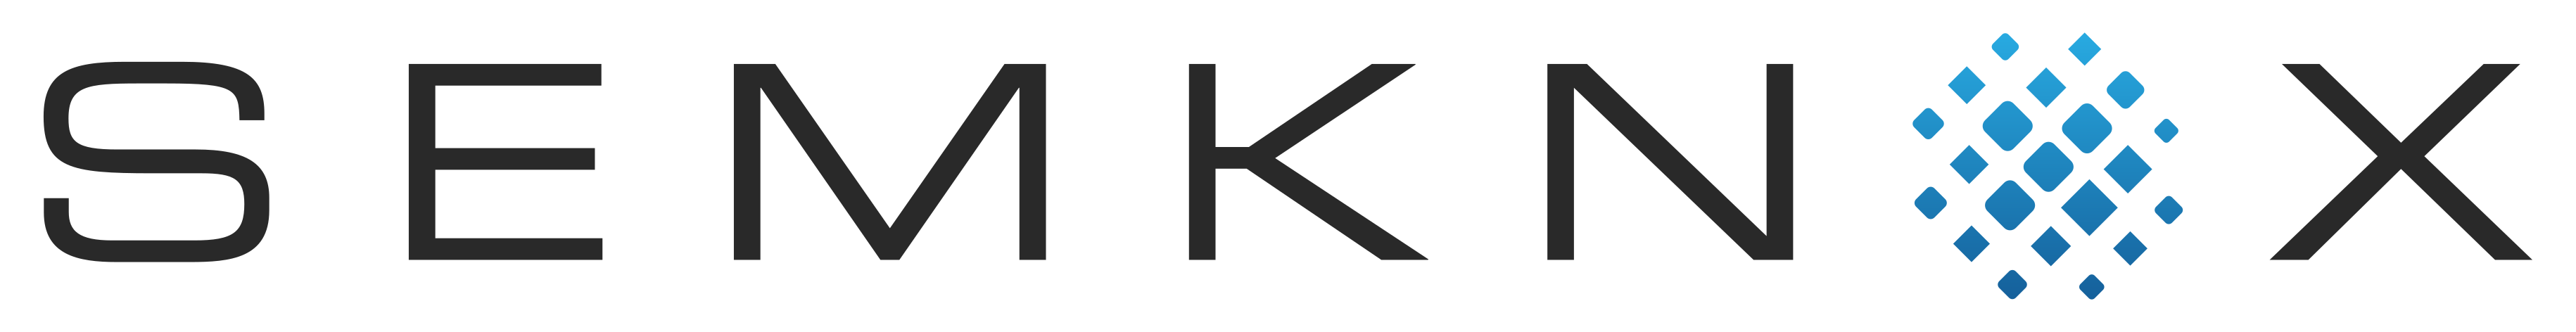 Site Search 360 logo